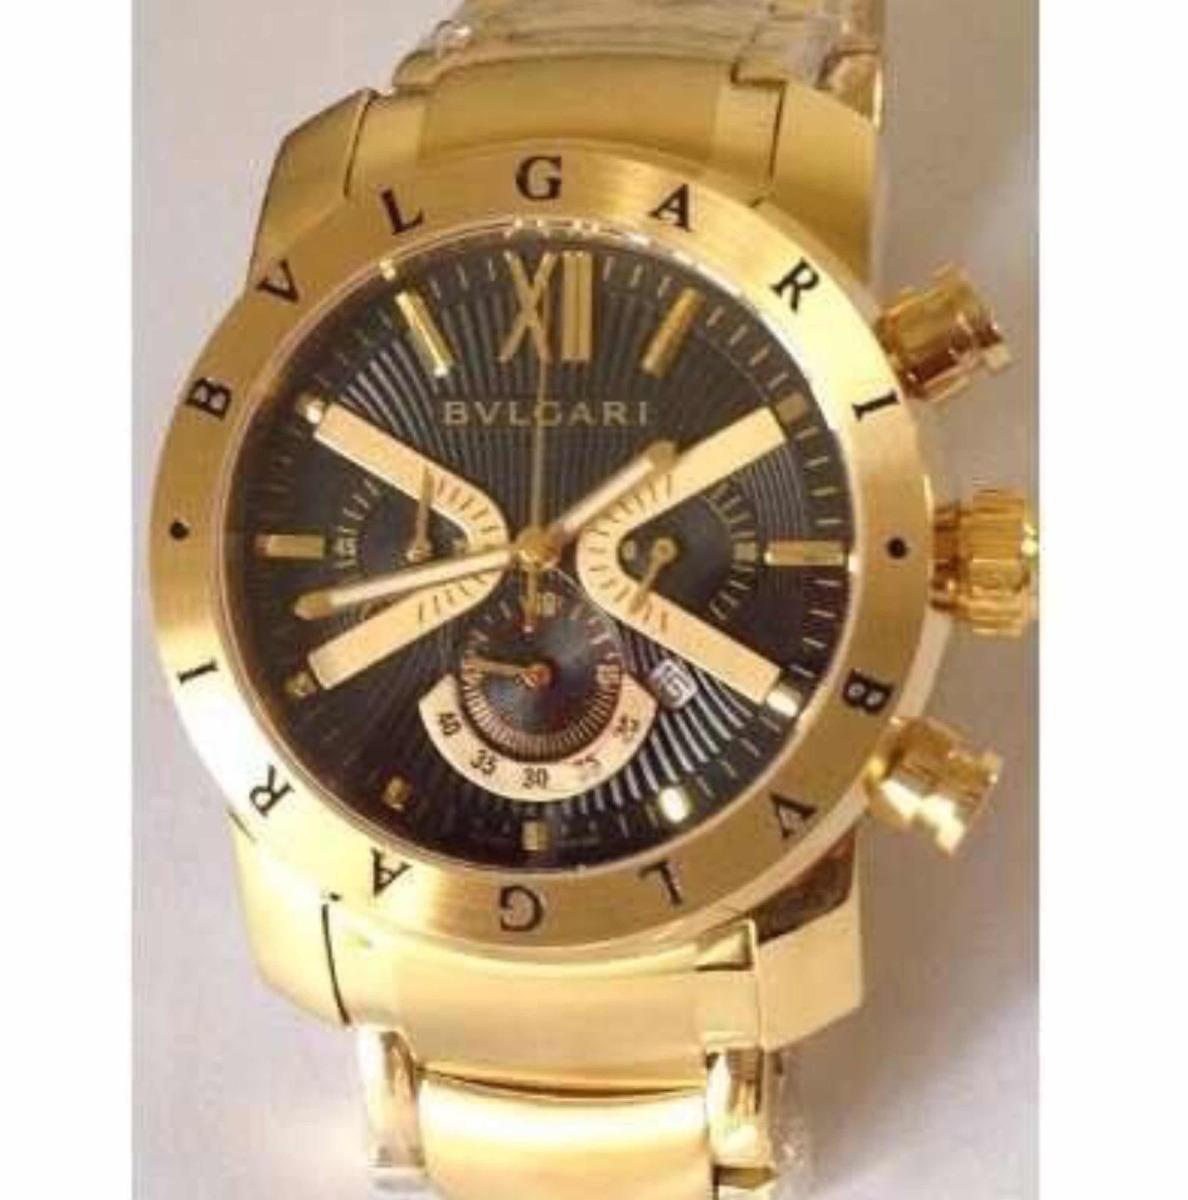 297ff52f8a9 Relógio Bvlgari Iron Man X Limited Dourado Fundo Preto - R  379